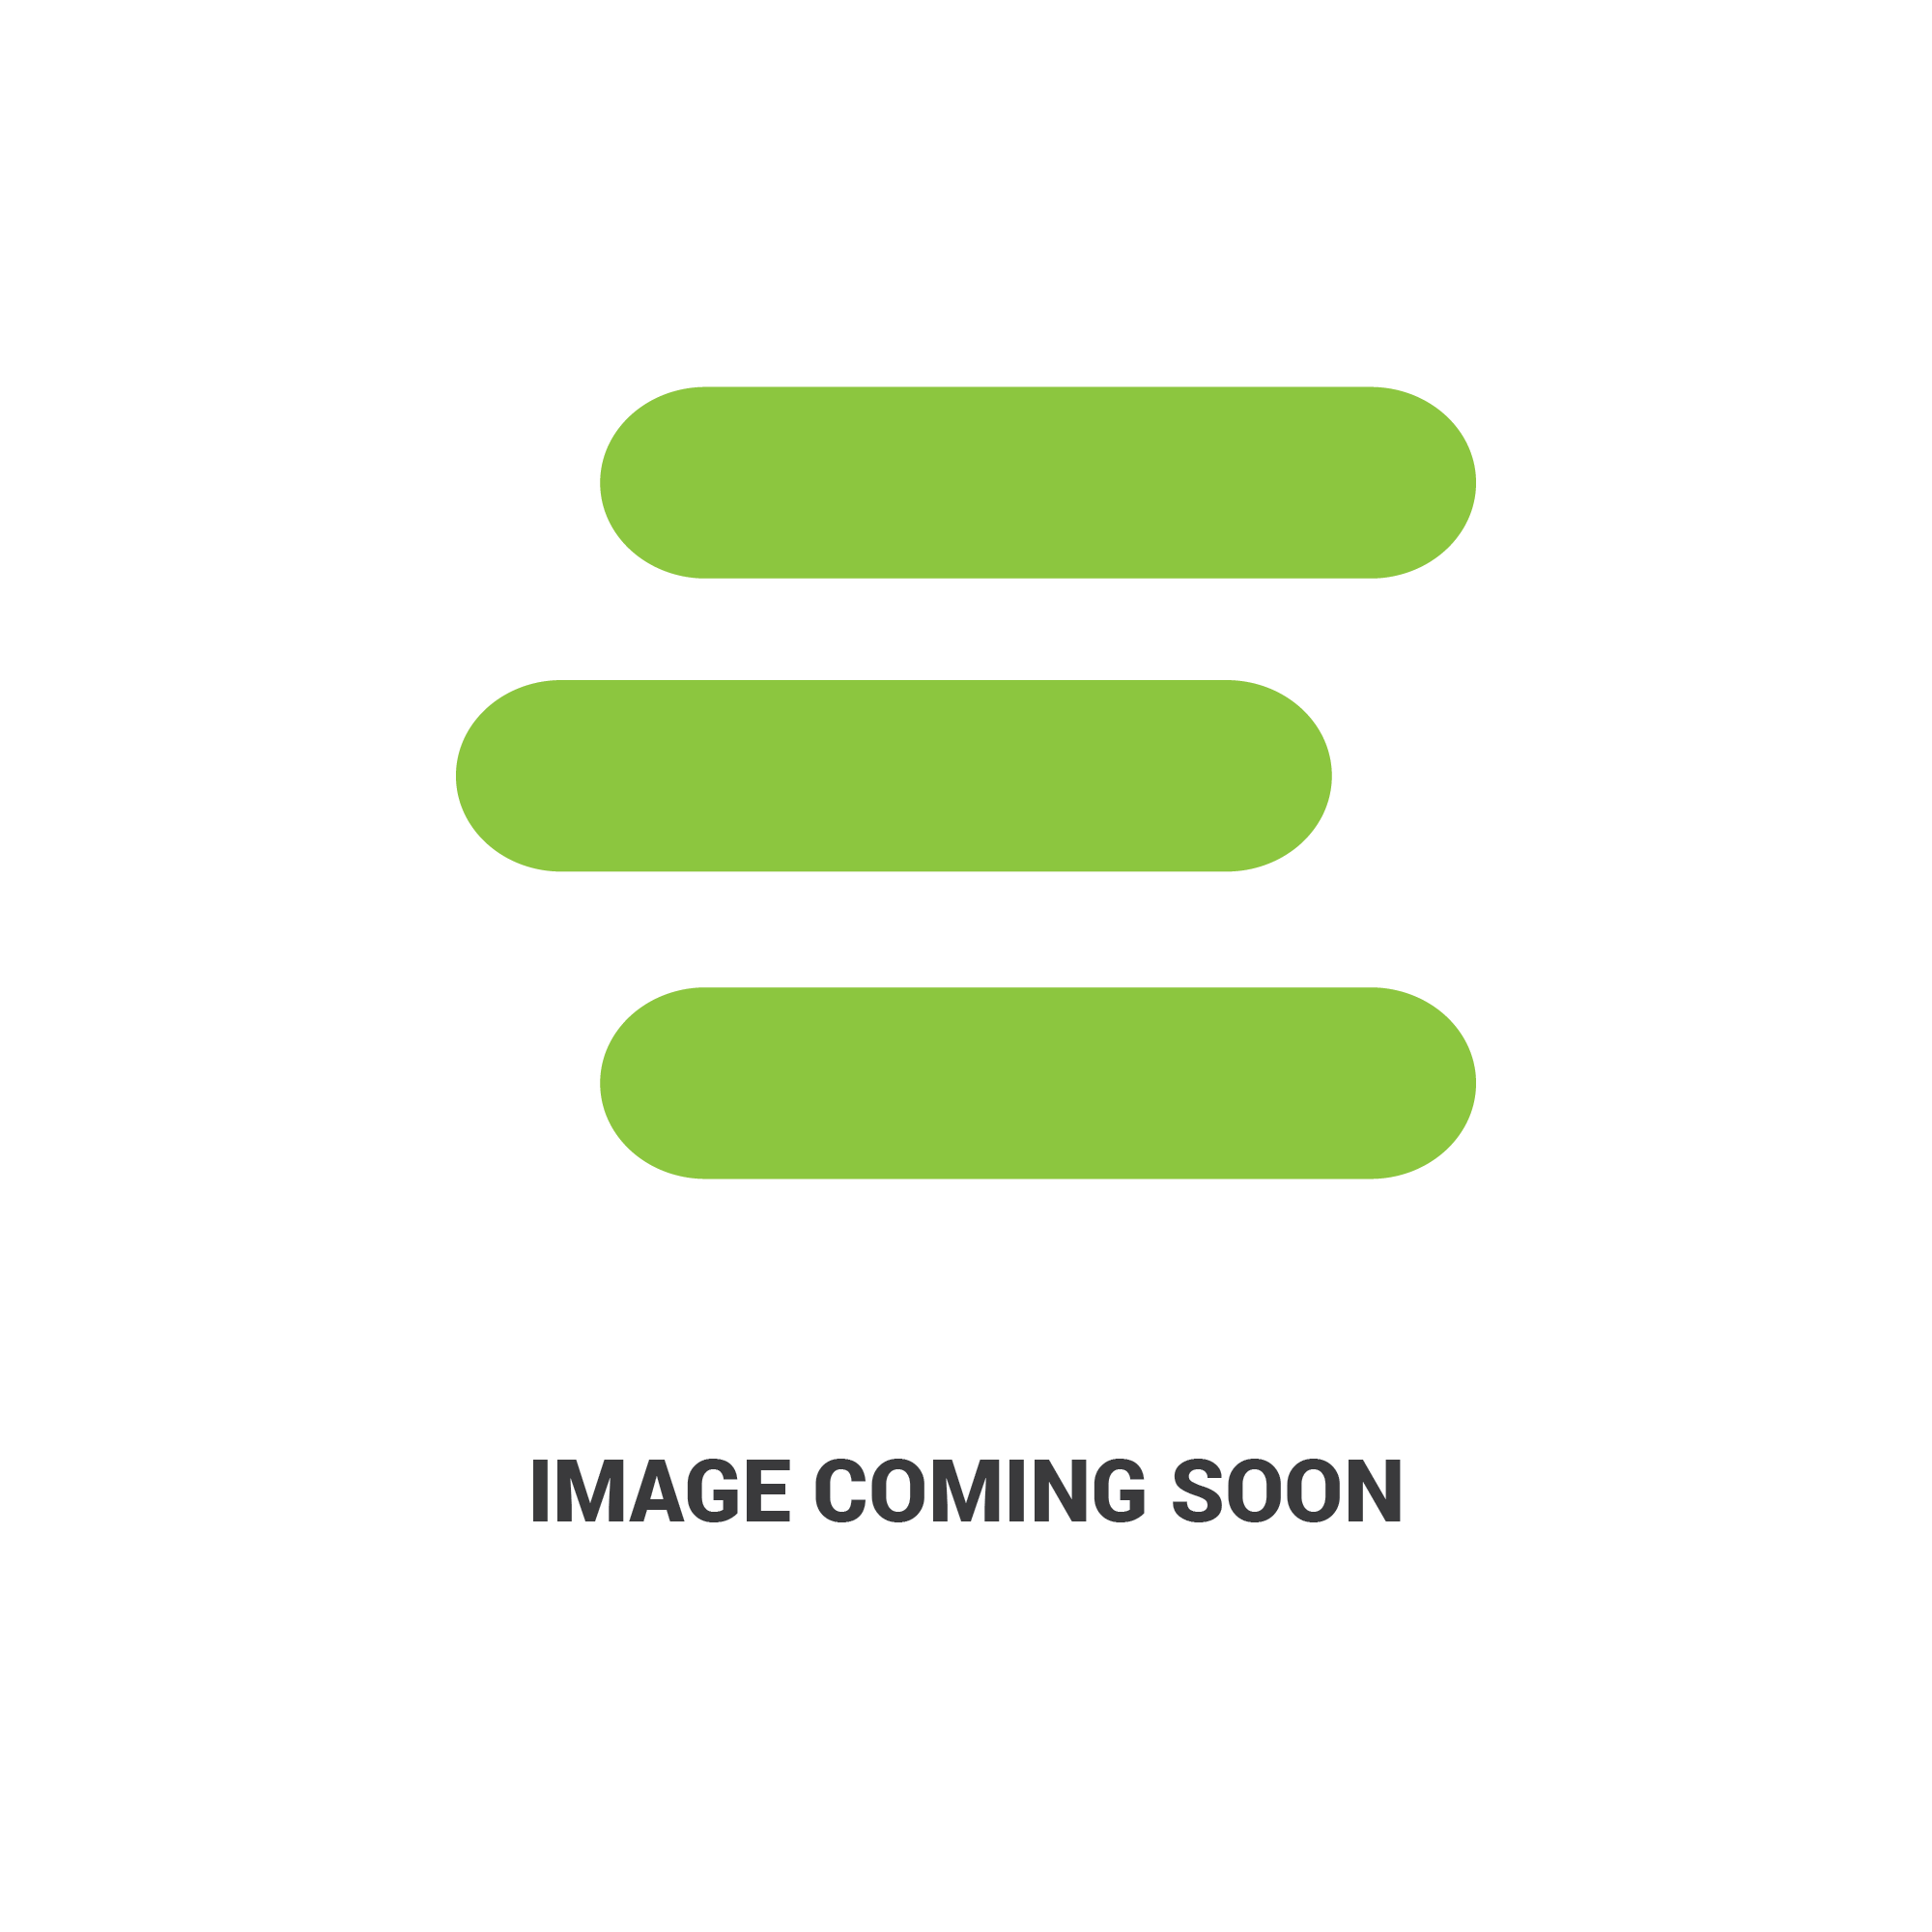 E-70000-16575edit 1.jpg